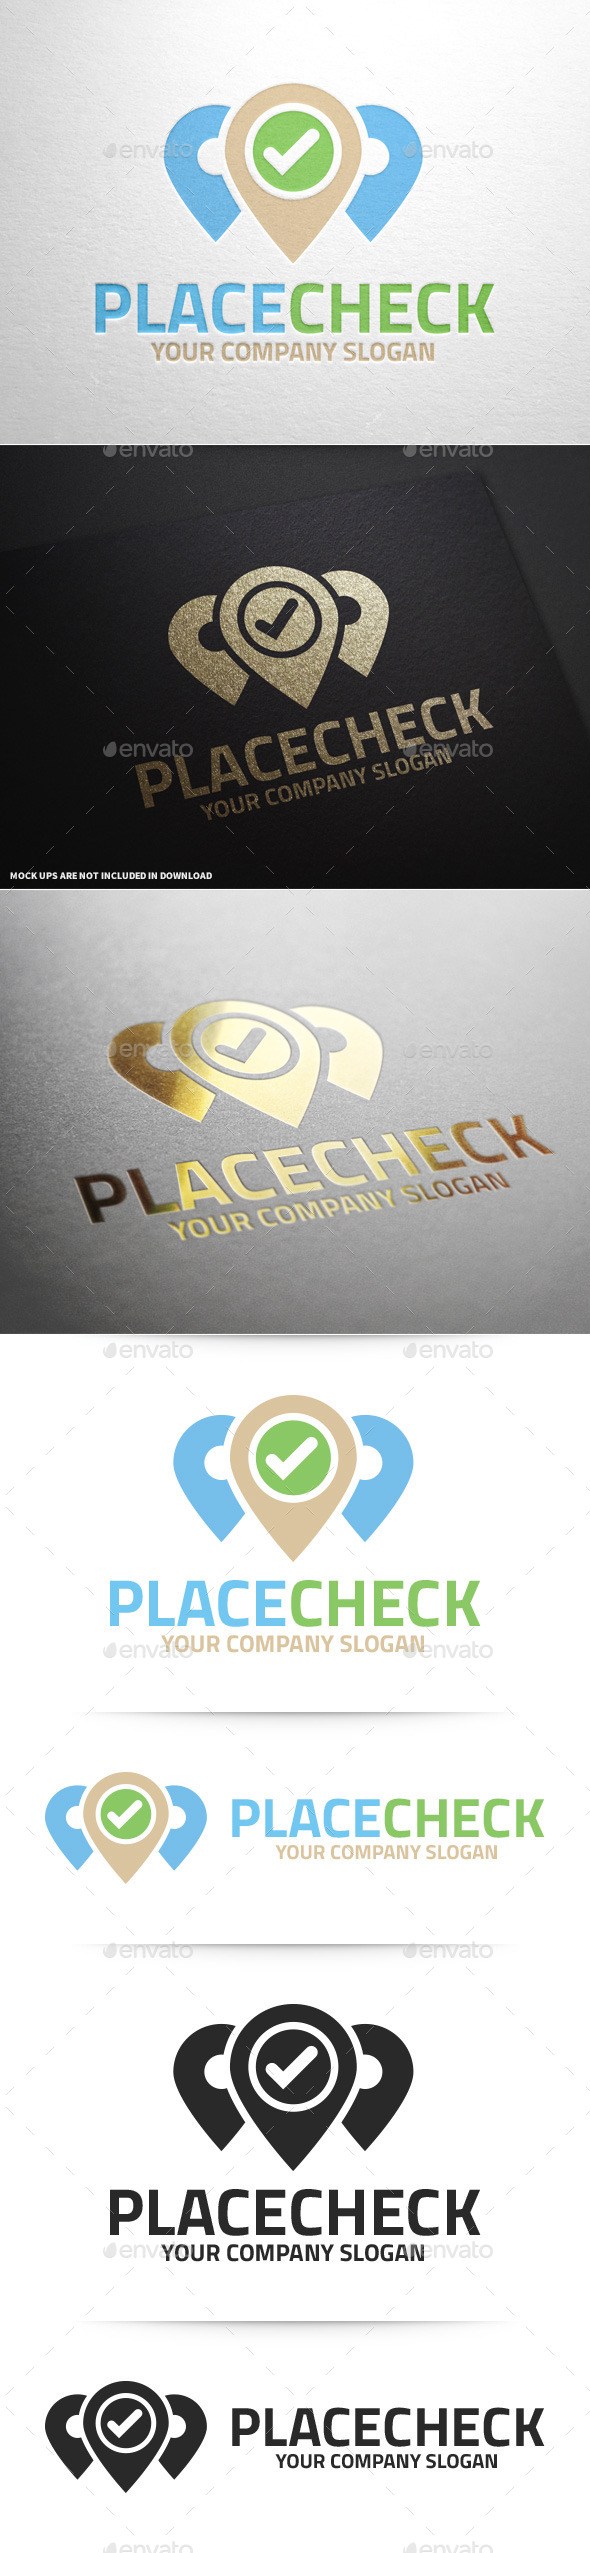 Place Check Logo Template - Symbols Logo Templates